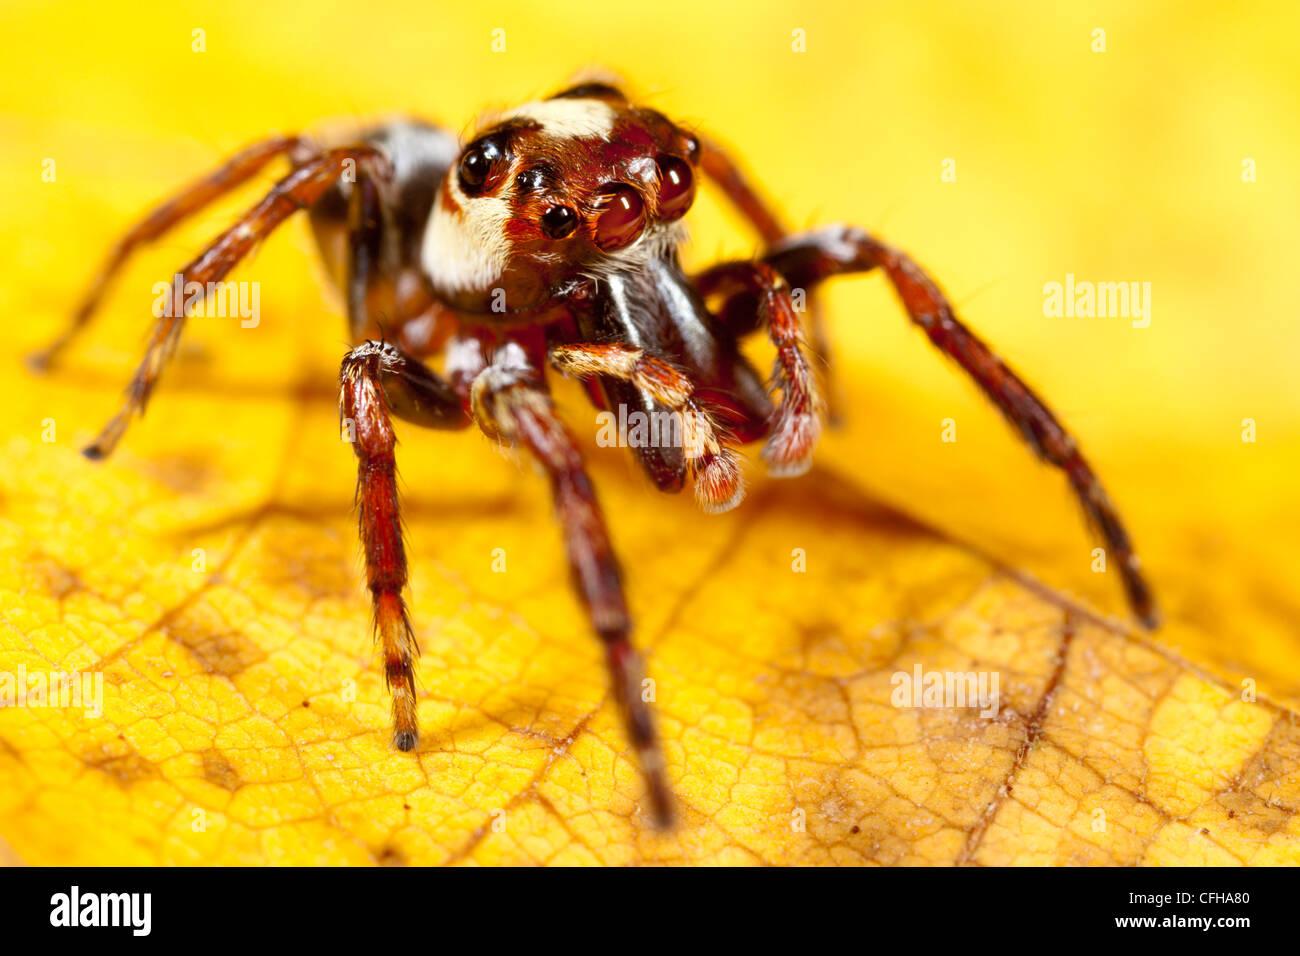 Jumping spider su foglie di giallo. Penisola di Masoala National Park, Madagascar. Immagini Stock